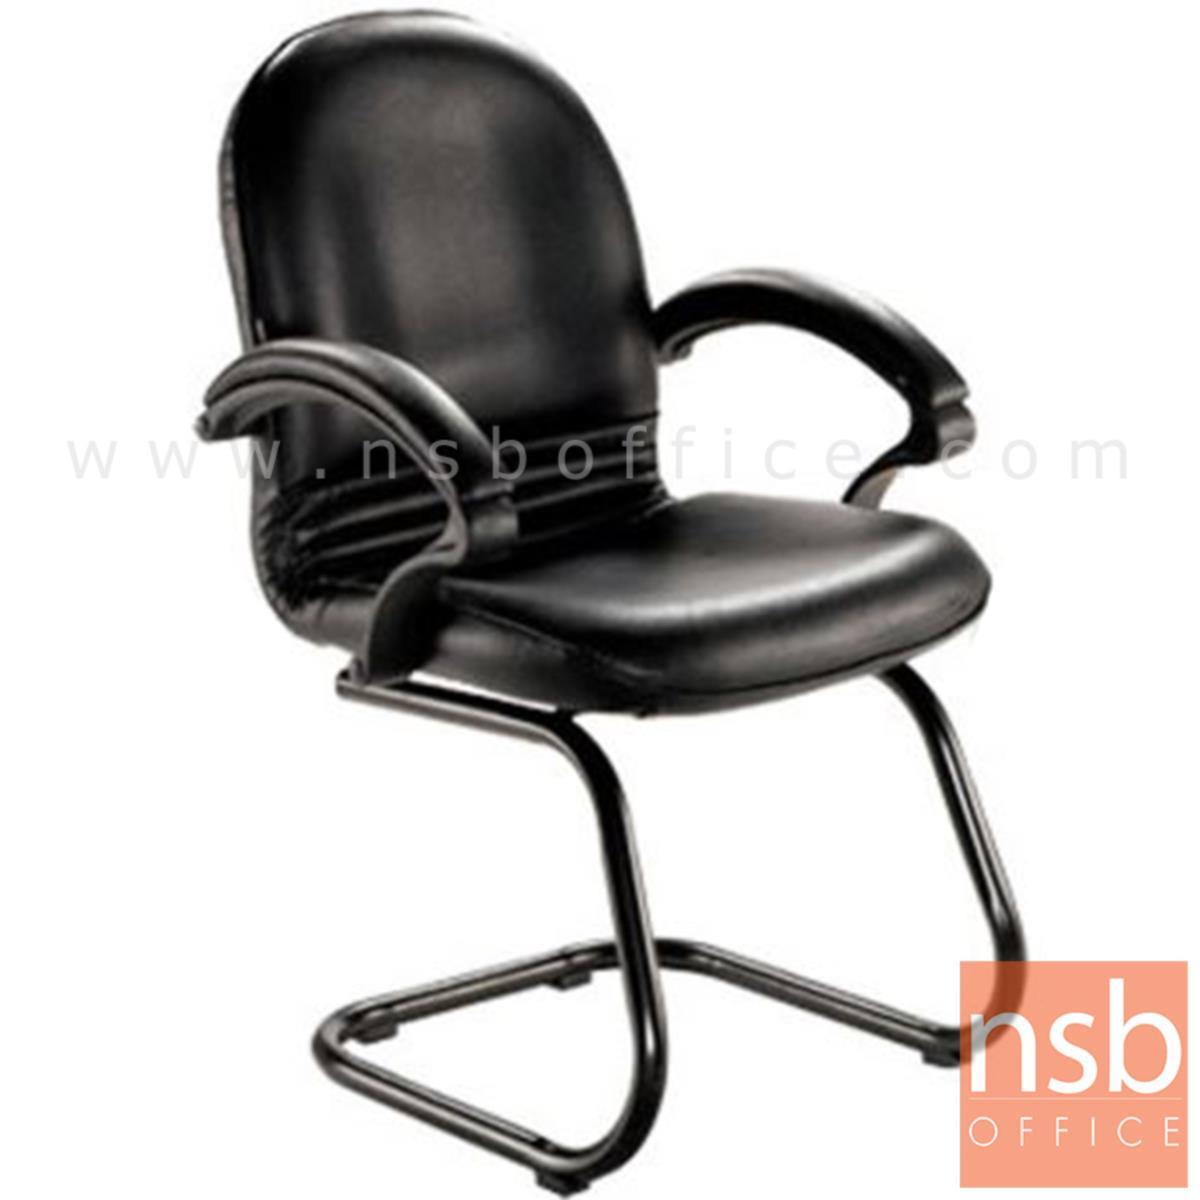 B04A156:เก้าอี้รับแขกขาตัวซี รุ่น Red Ribbon 2  ขาเหล็กพ่นดำ